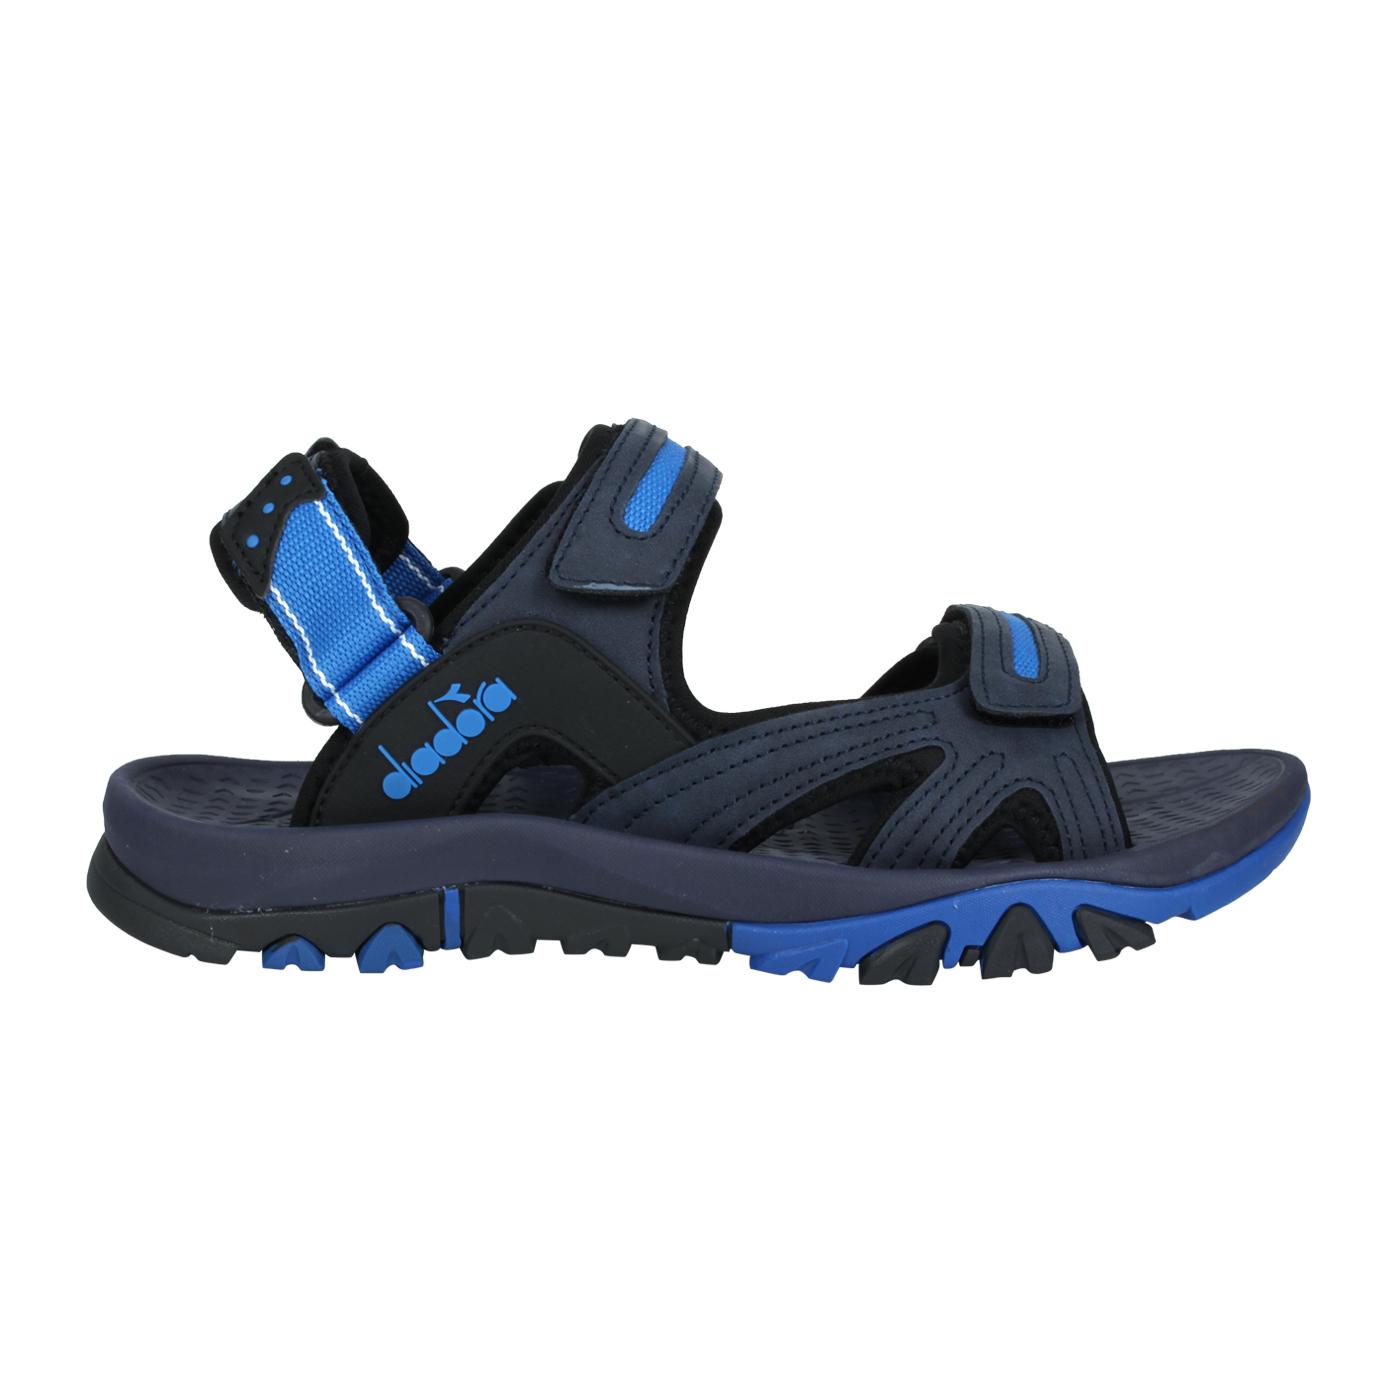 DIADORA 男款運動涼鞋 DA71202 - 丈青藍白